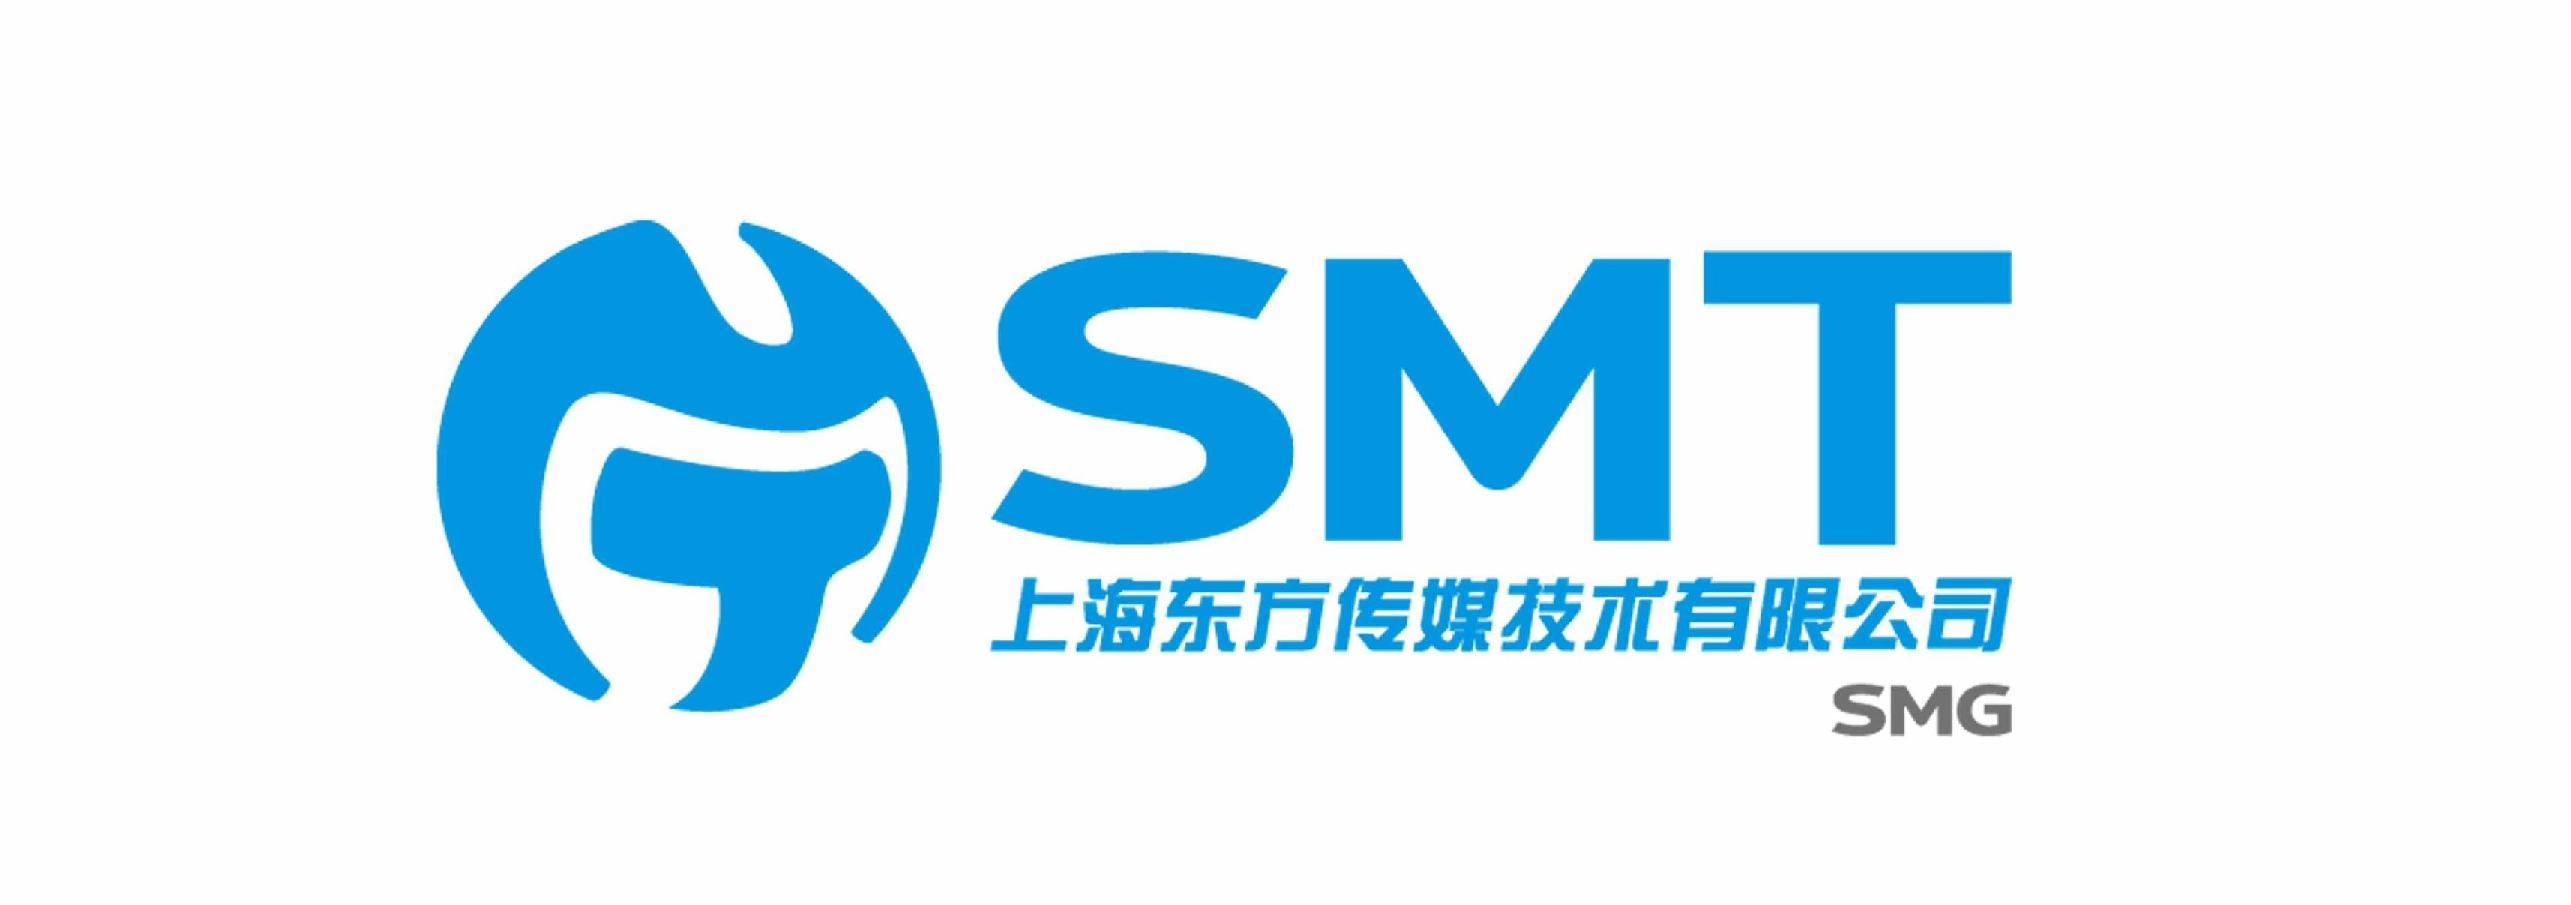 SMT上海东方传媒技术